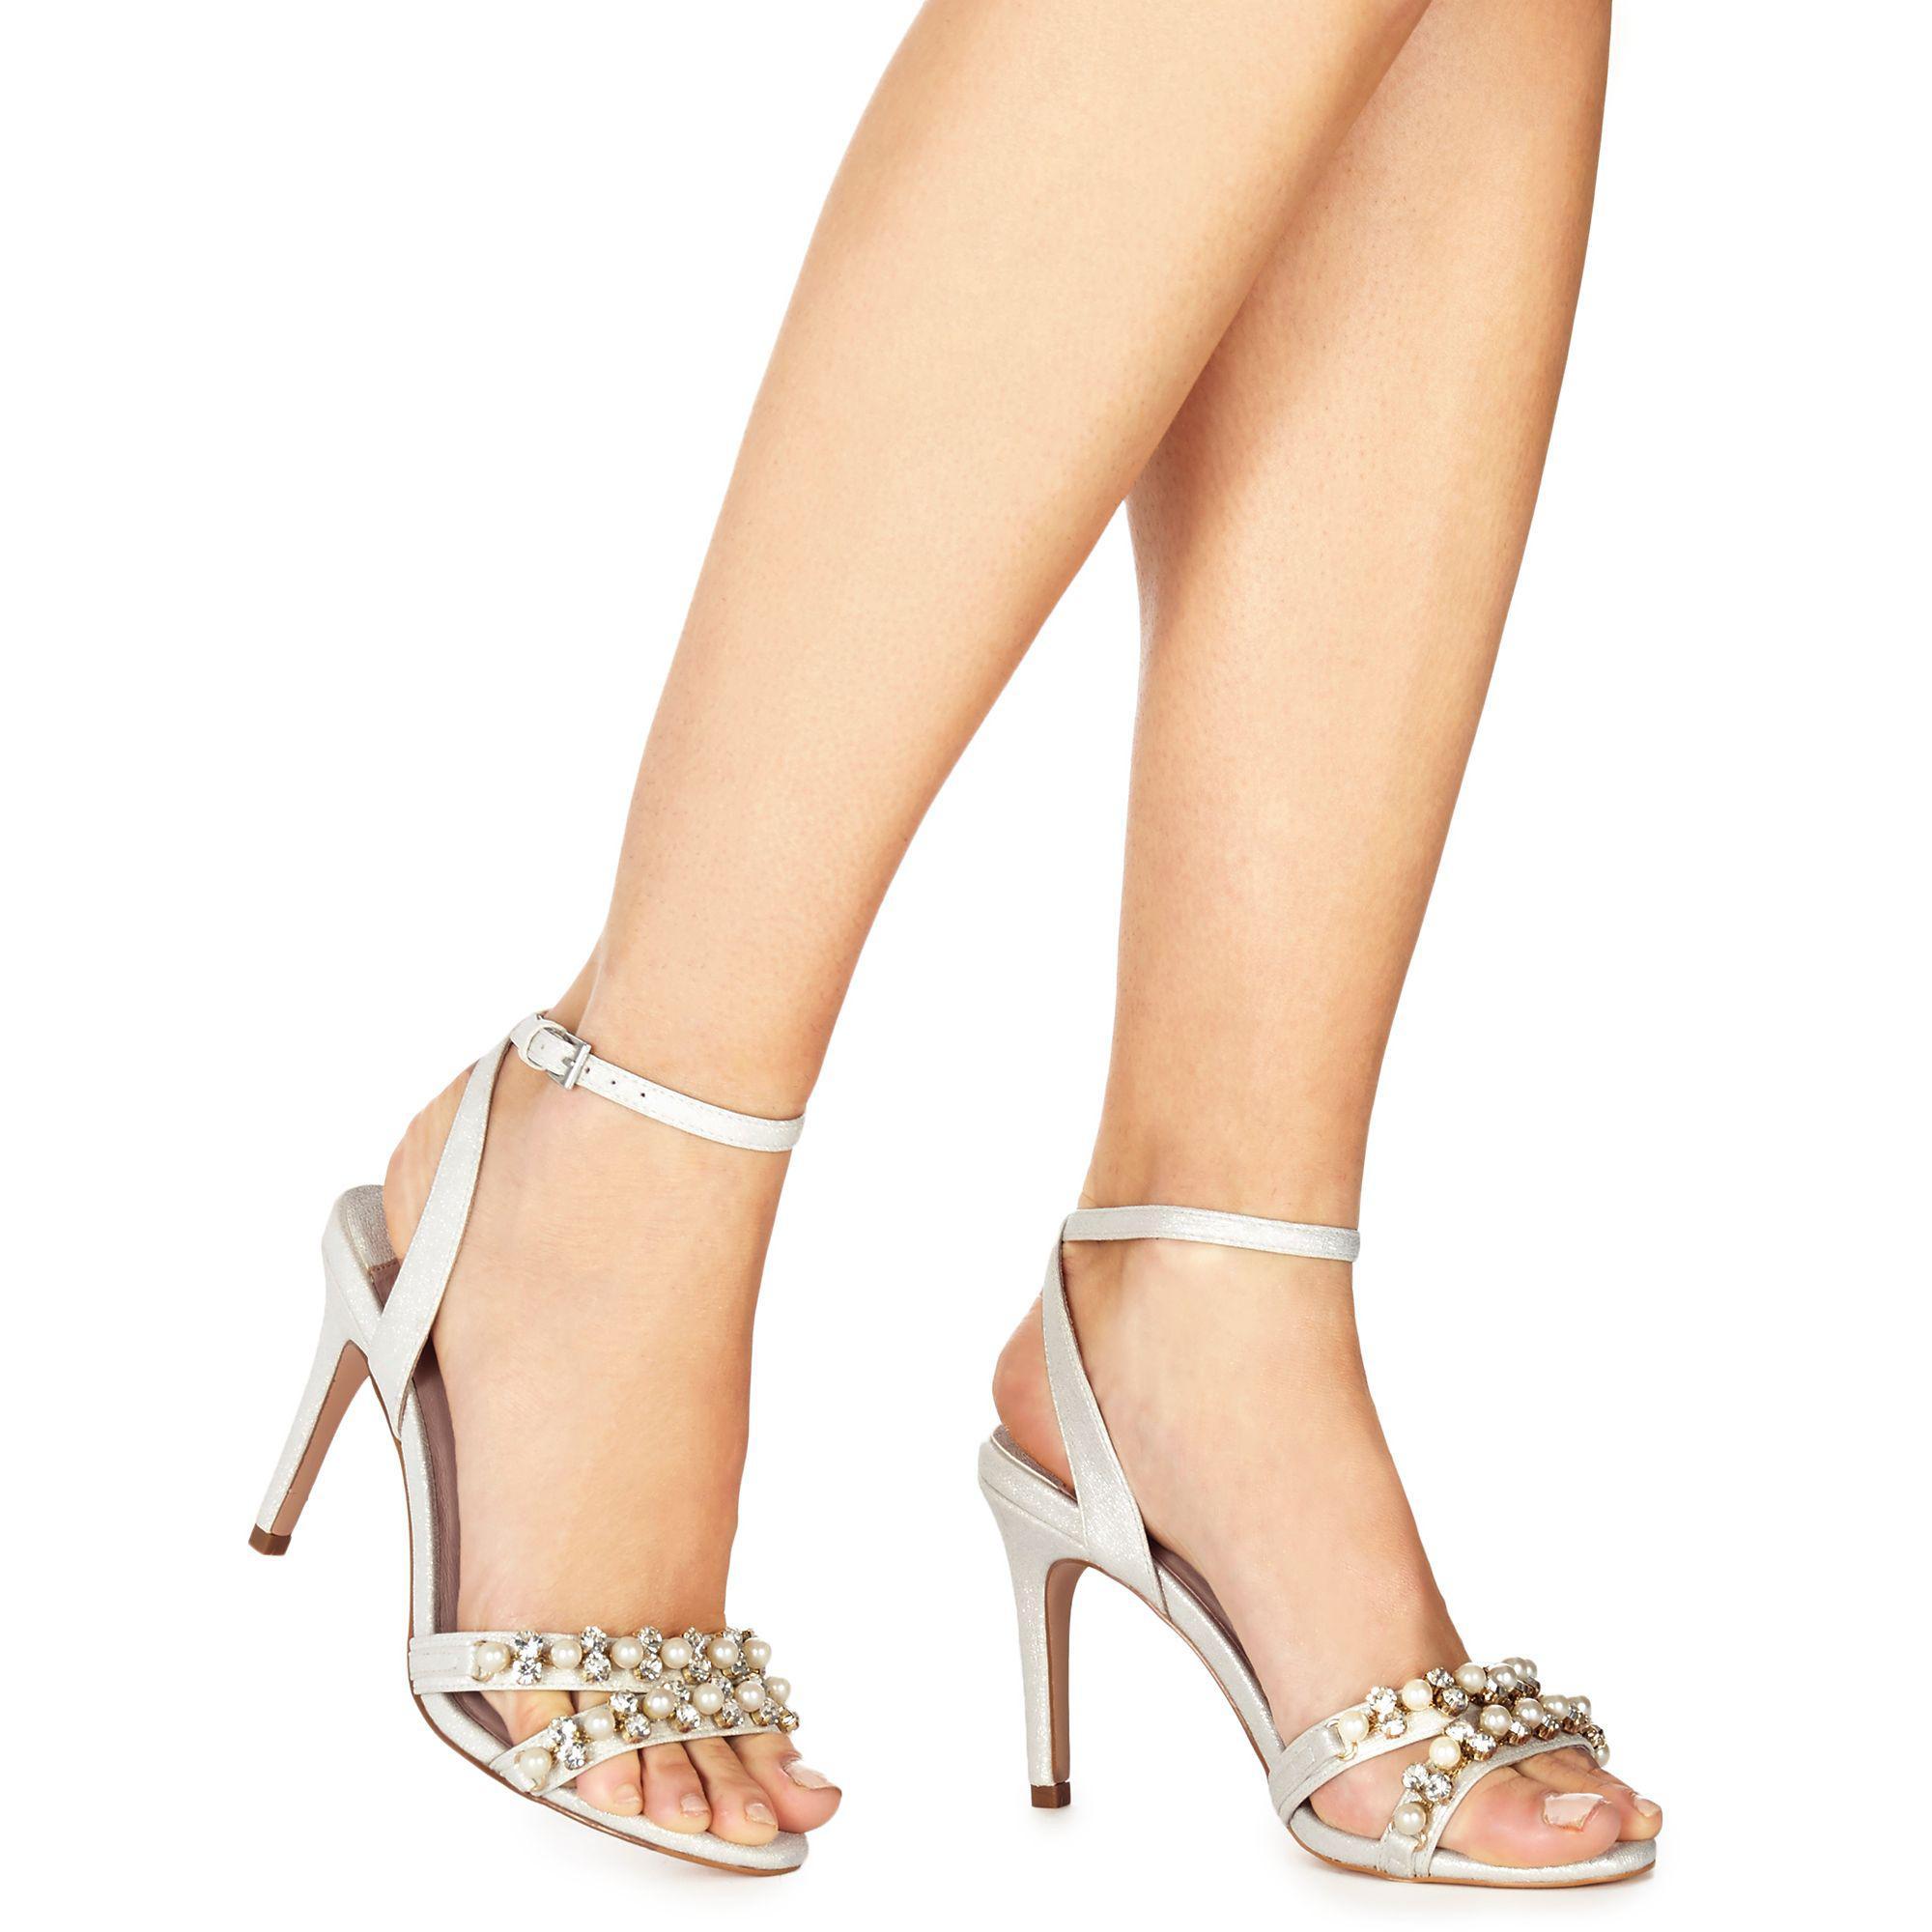 0570d9e6f01 Faith. Women s White Ivory Metallic  darha  High Stiletto Heel Ankle Strap  Sandals